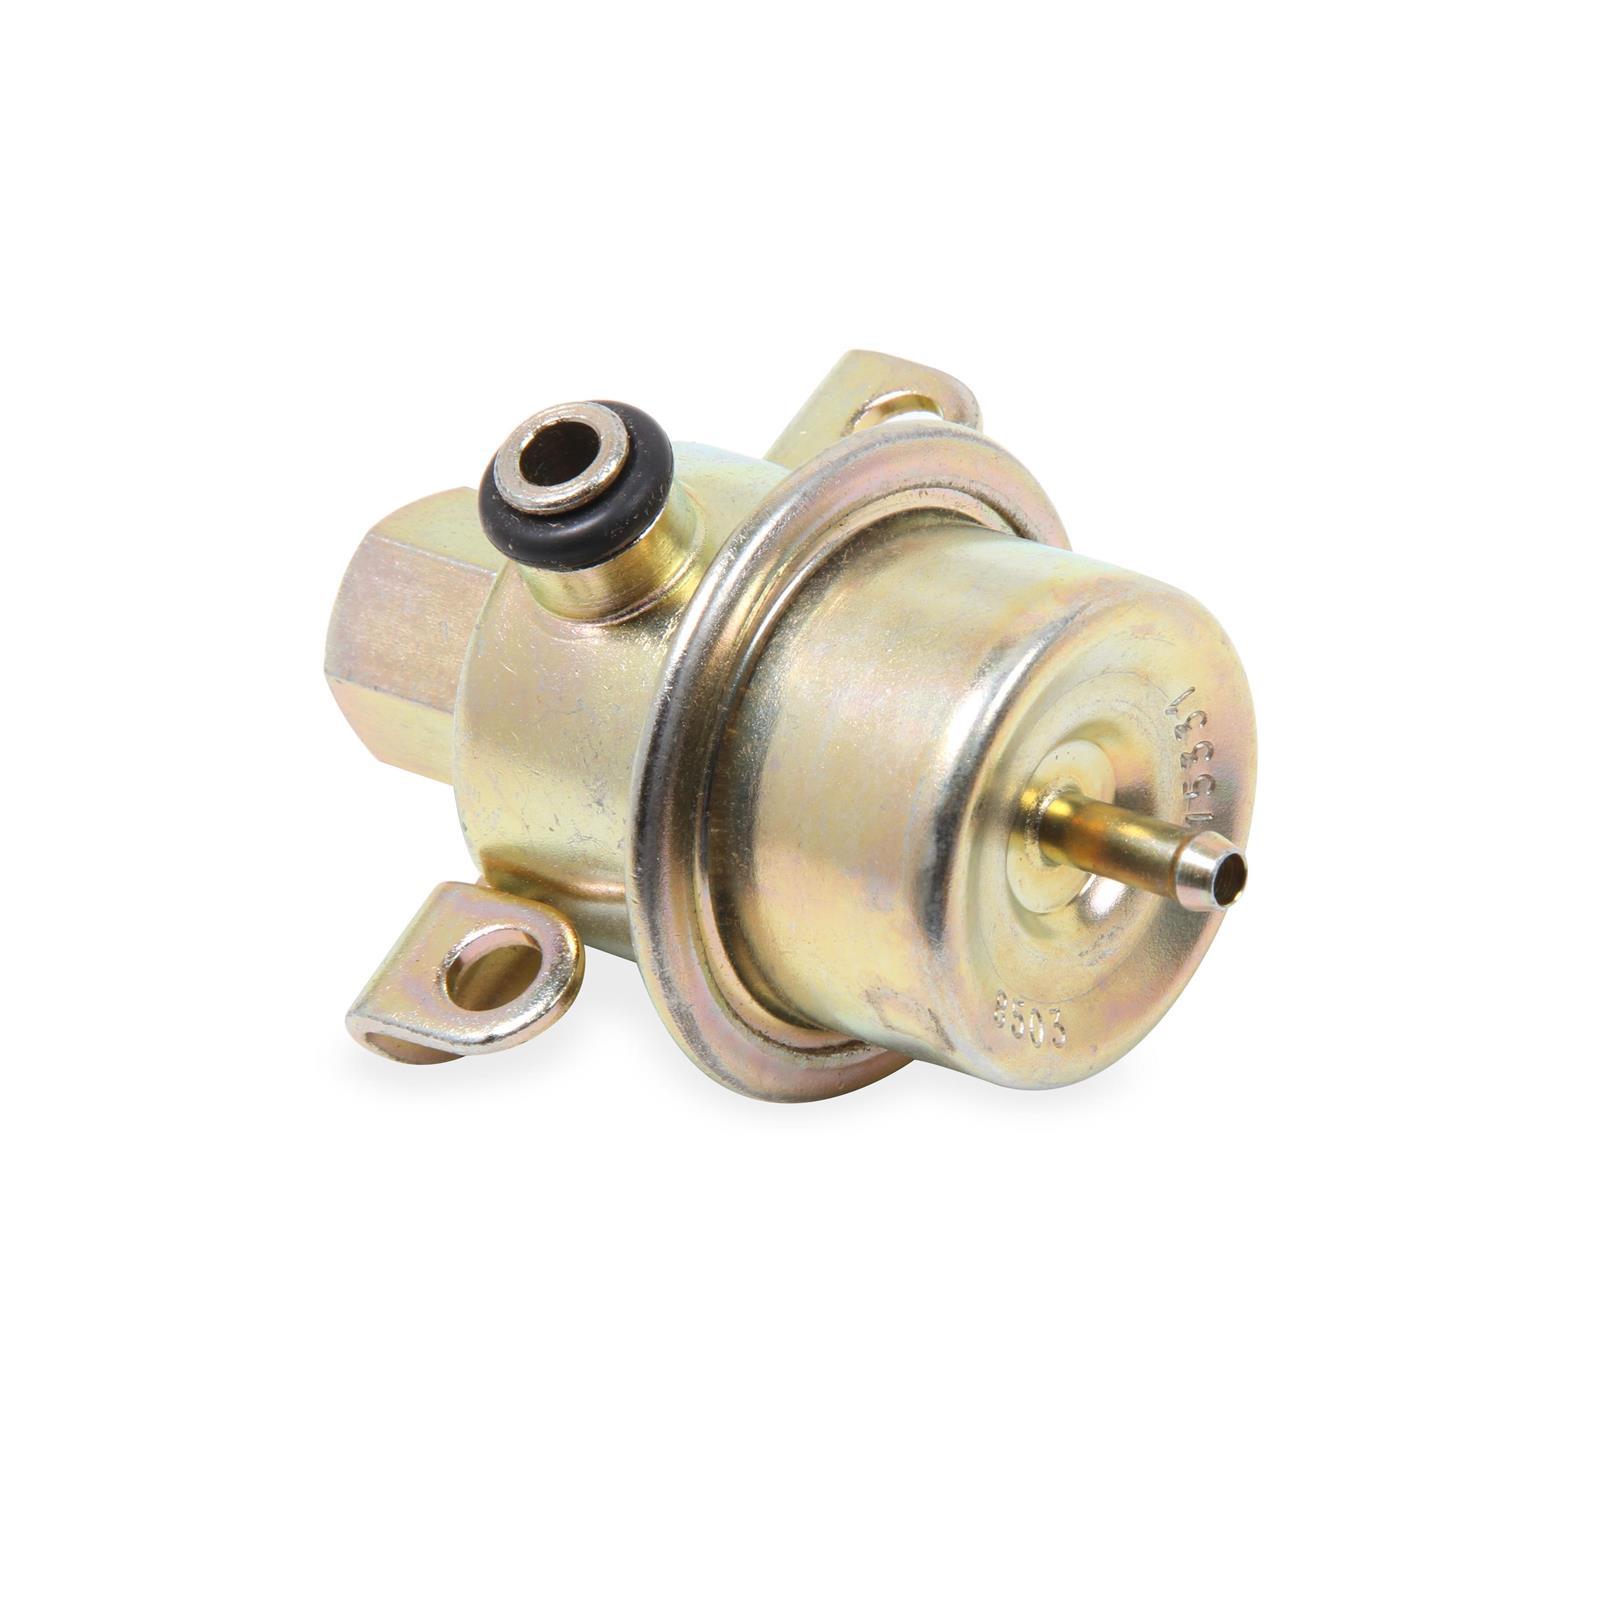 12-848 Holley Performance Dominator Billet EFI By-Pass Fuel Pressure Regulator